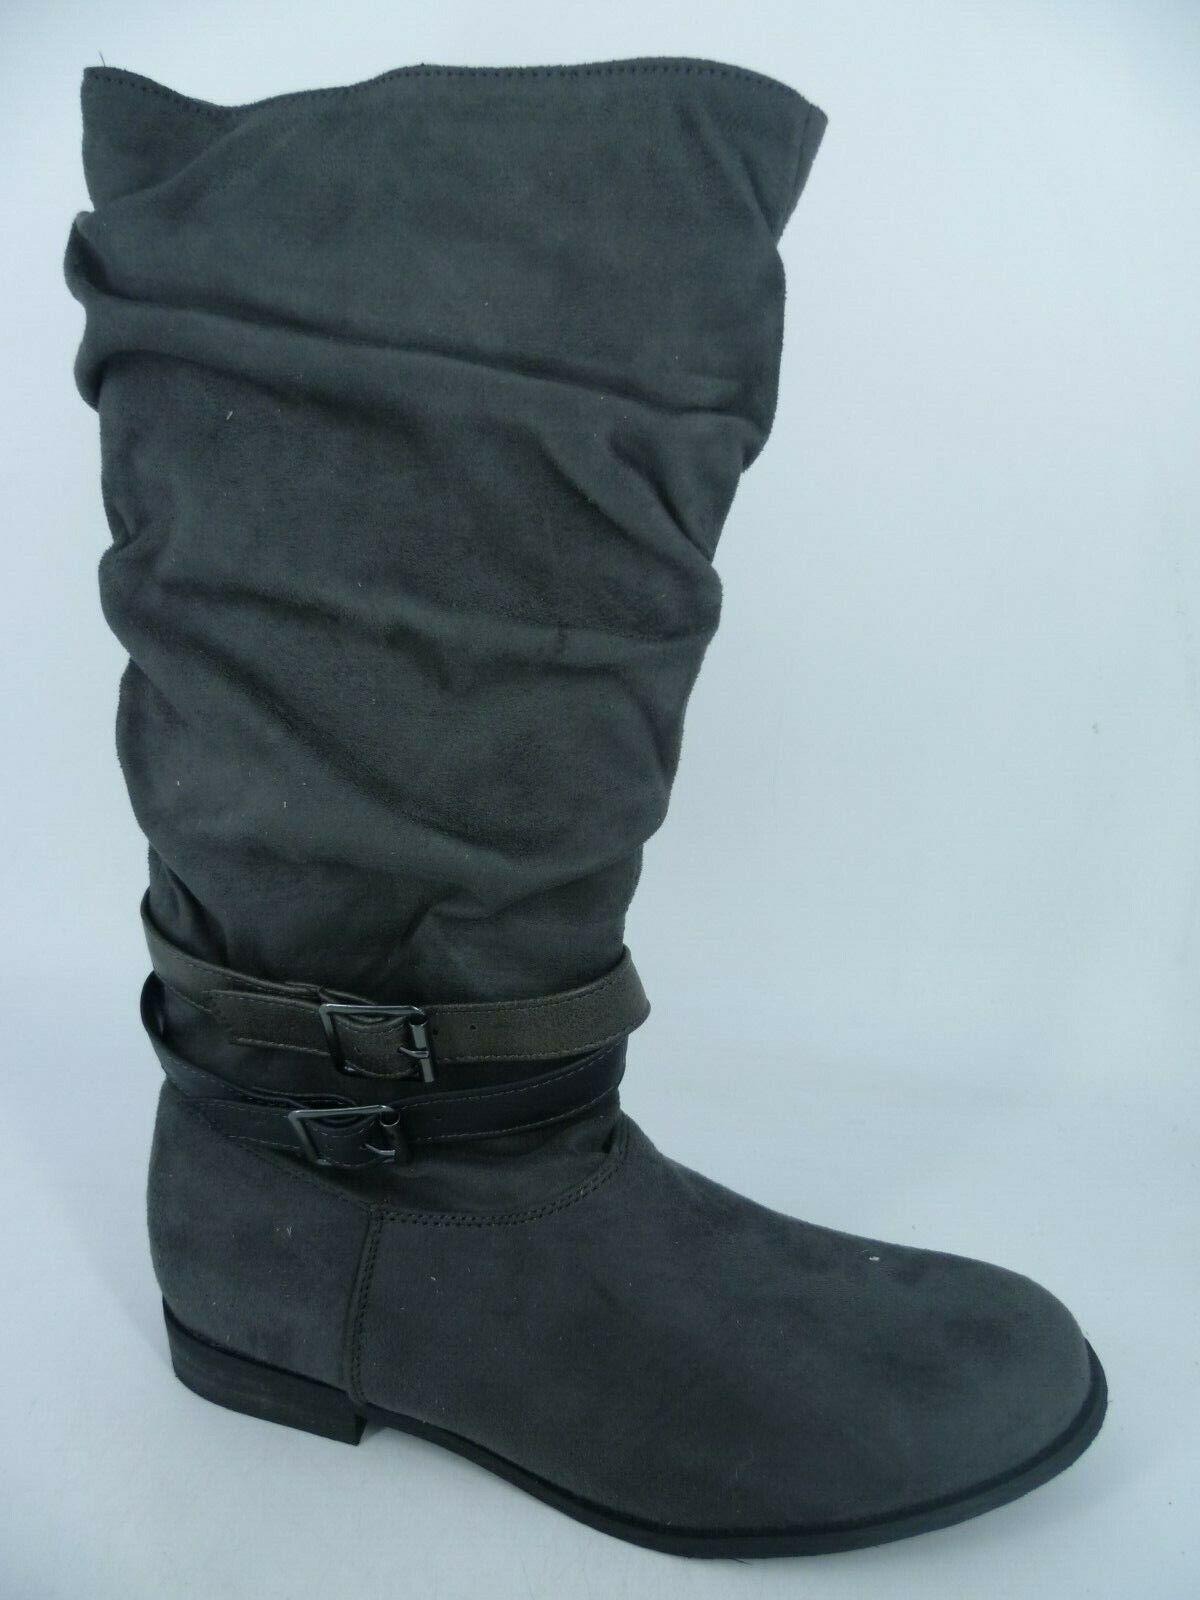 City Walk Knee High Buckled Boots Grey UK 6 EU 39 LN093 QQ 05